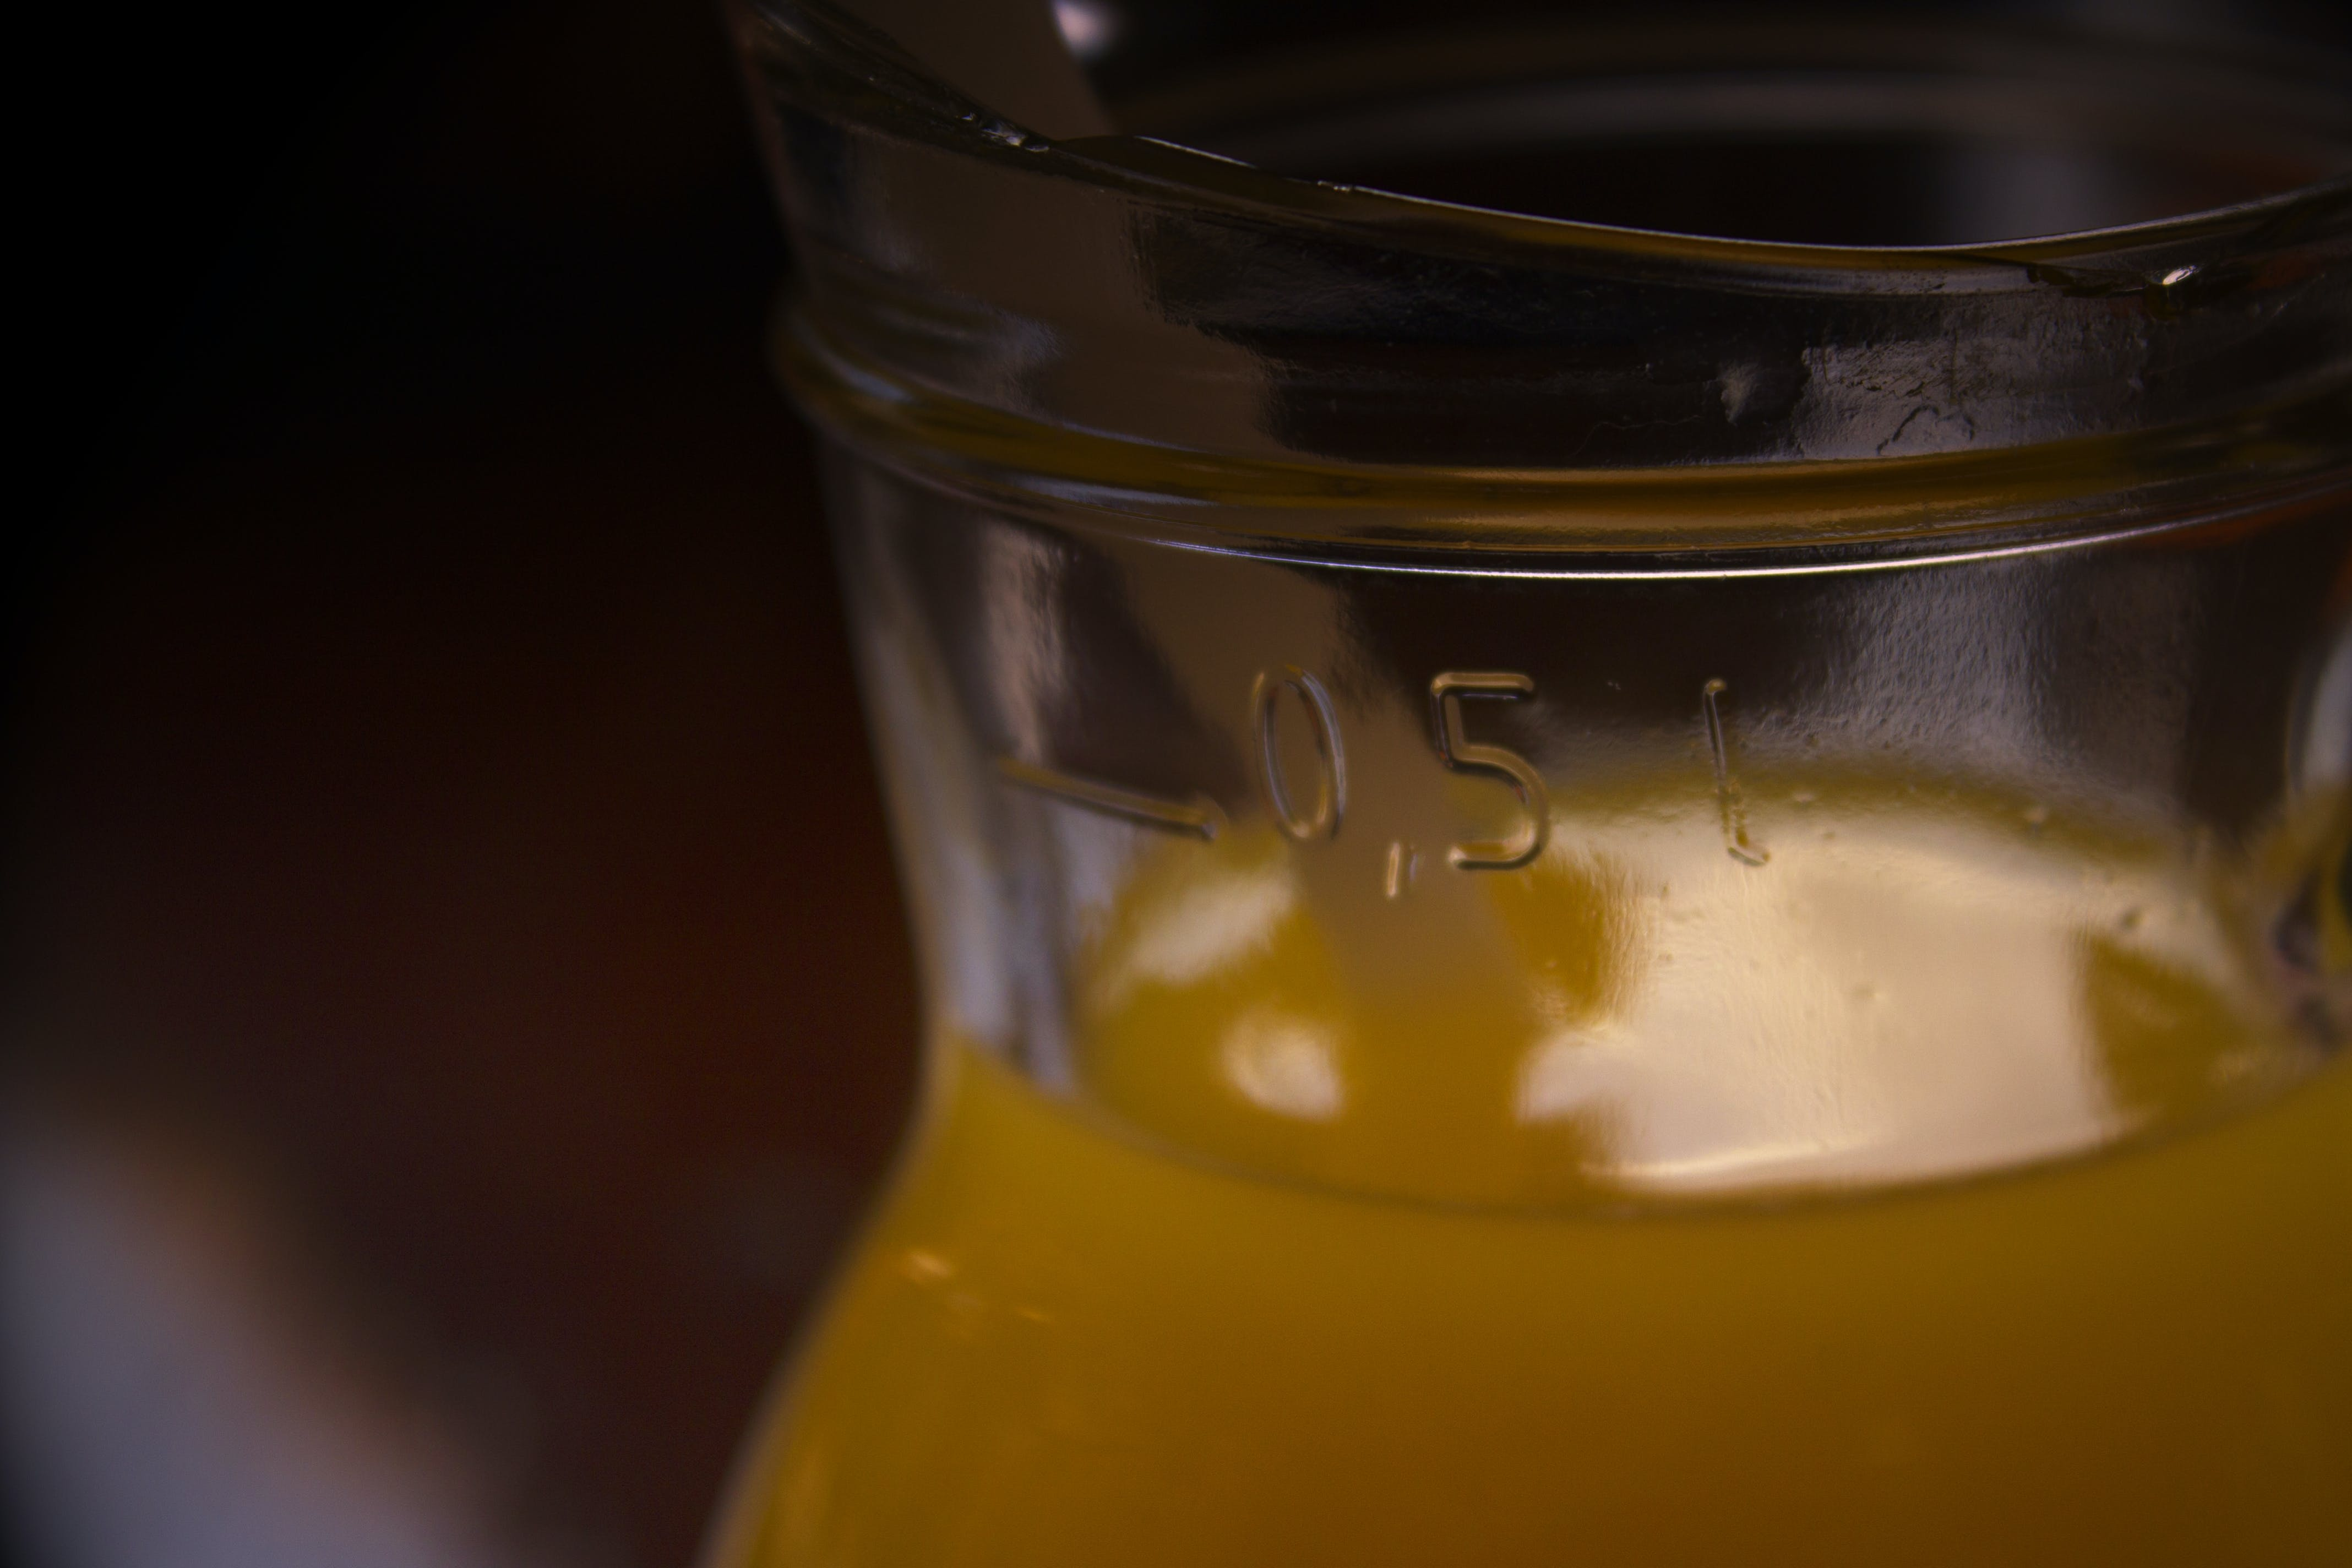 Free stock photo of lemonade